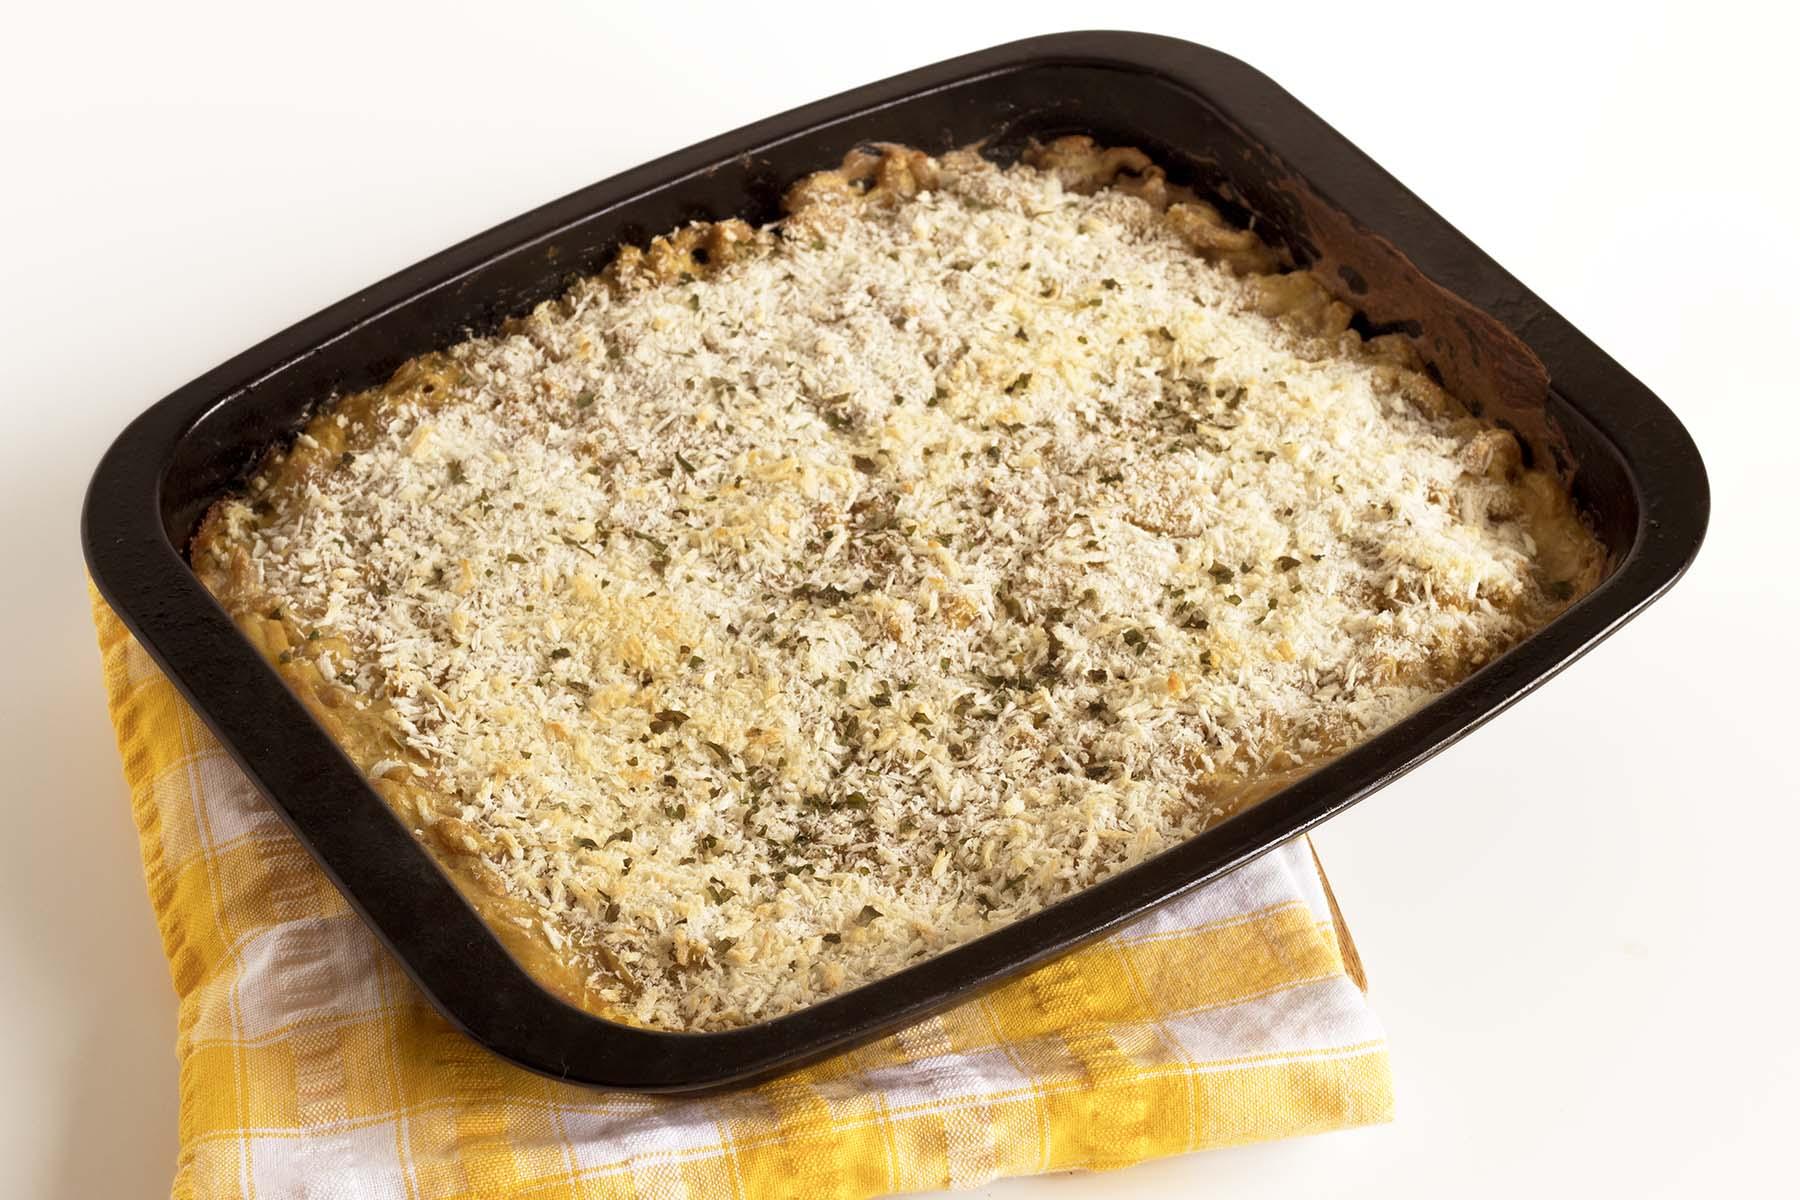 vegan butternut squash macaroni cheese in baking dish